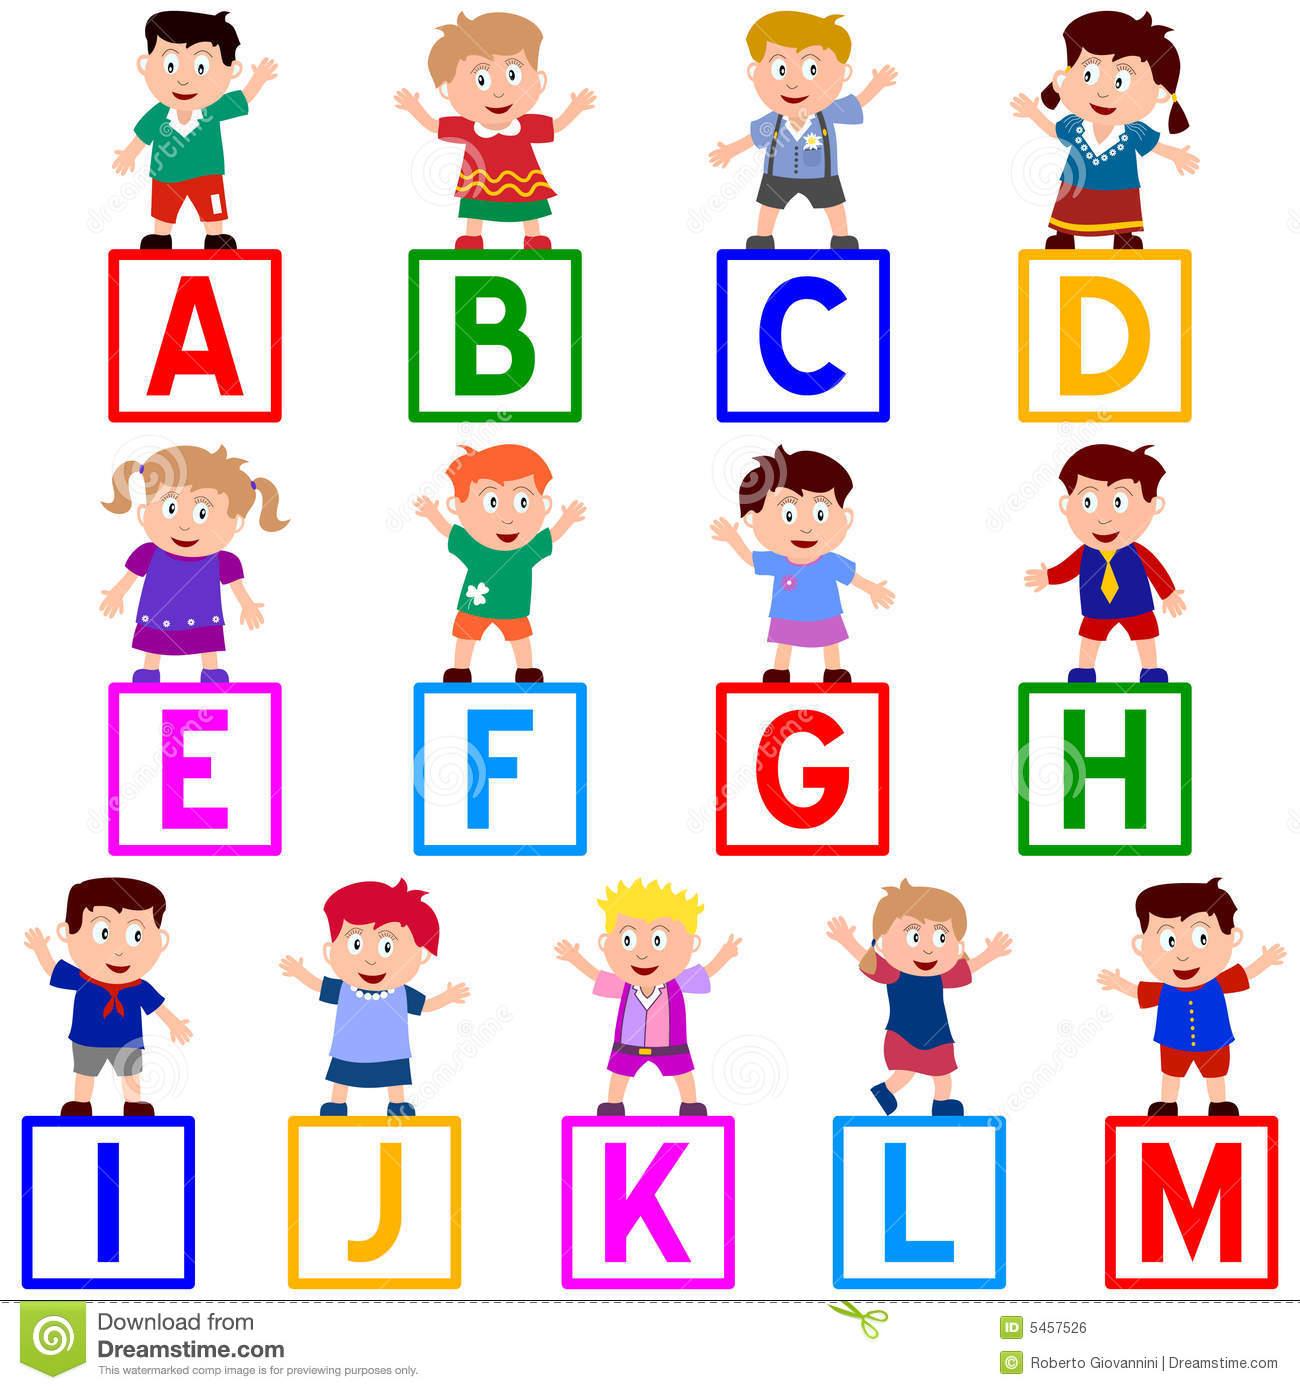 Alphabet Clipart Free Download.